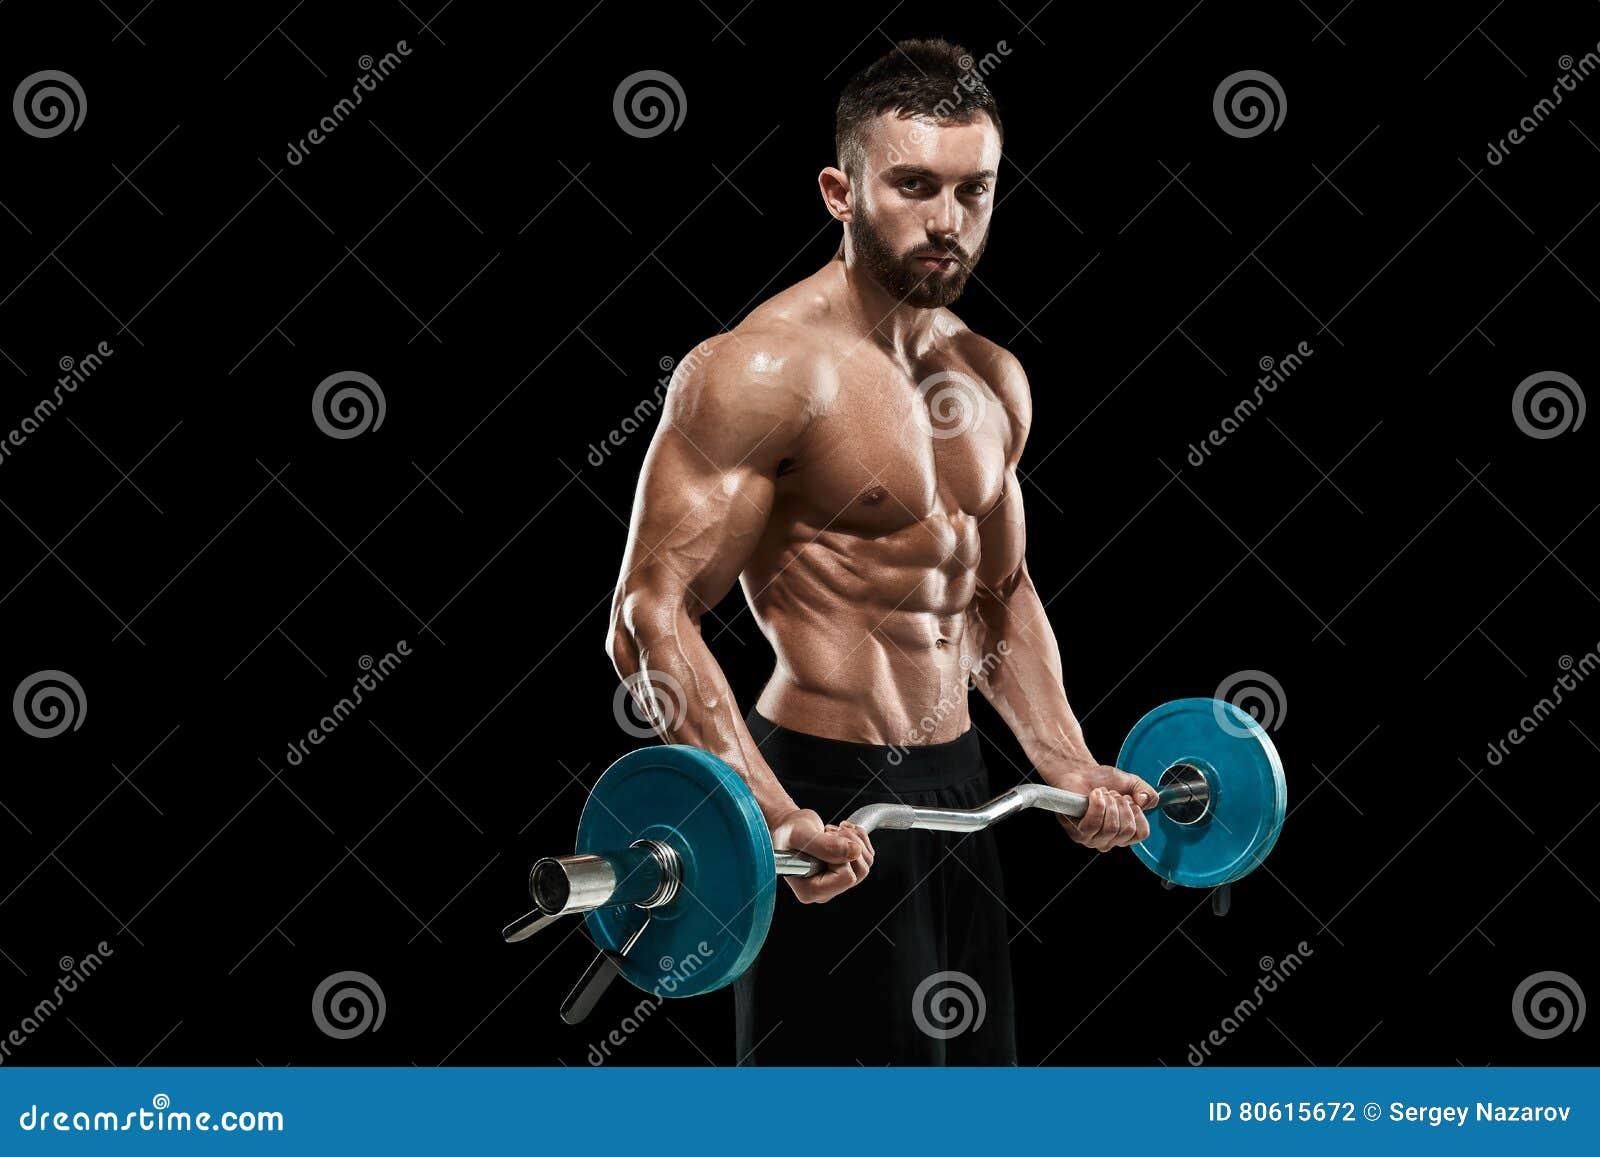 Bodybuilder Lifting Dumbbell Stock Photo - Image of